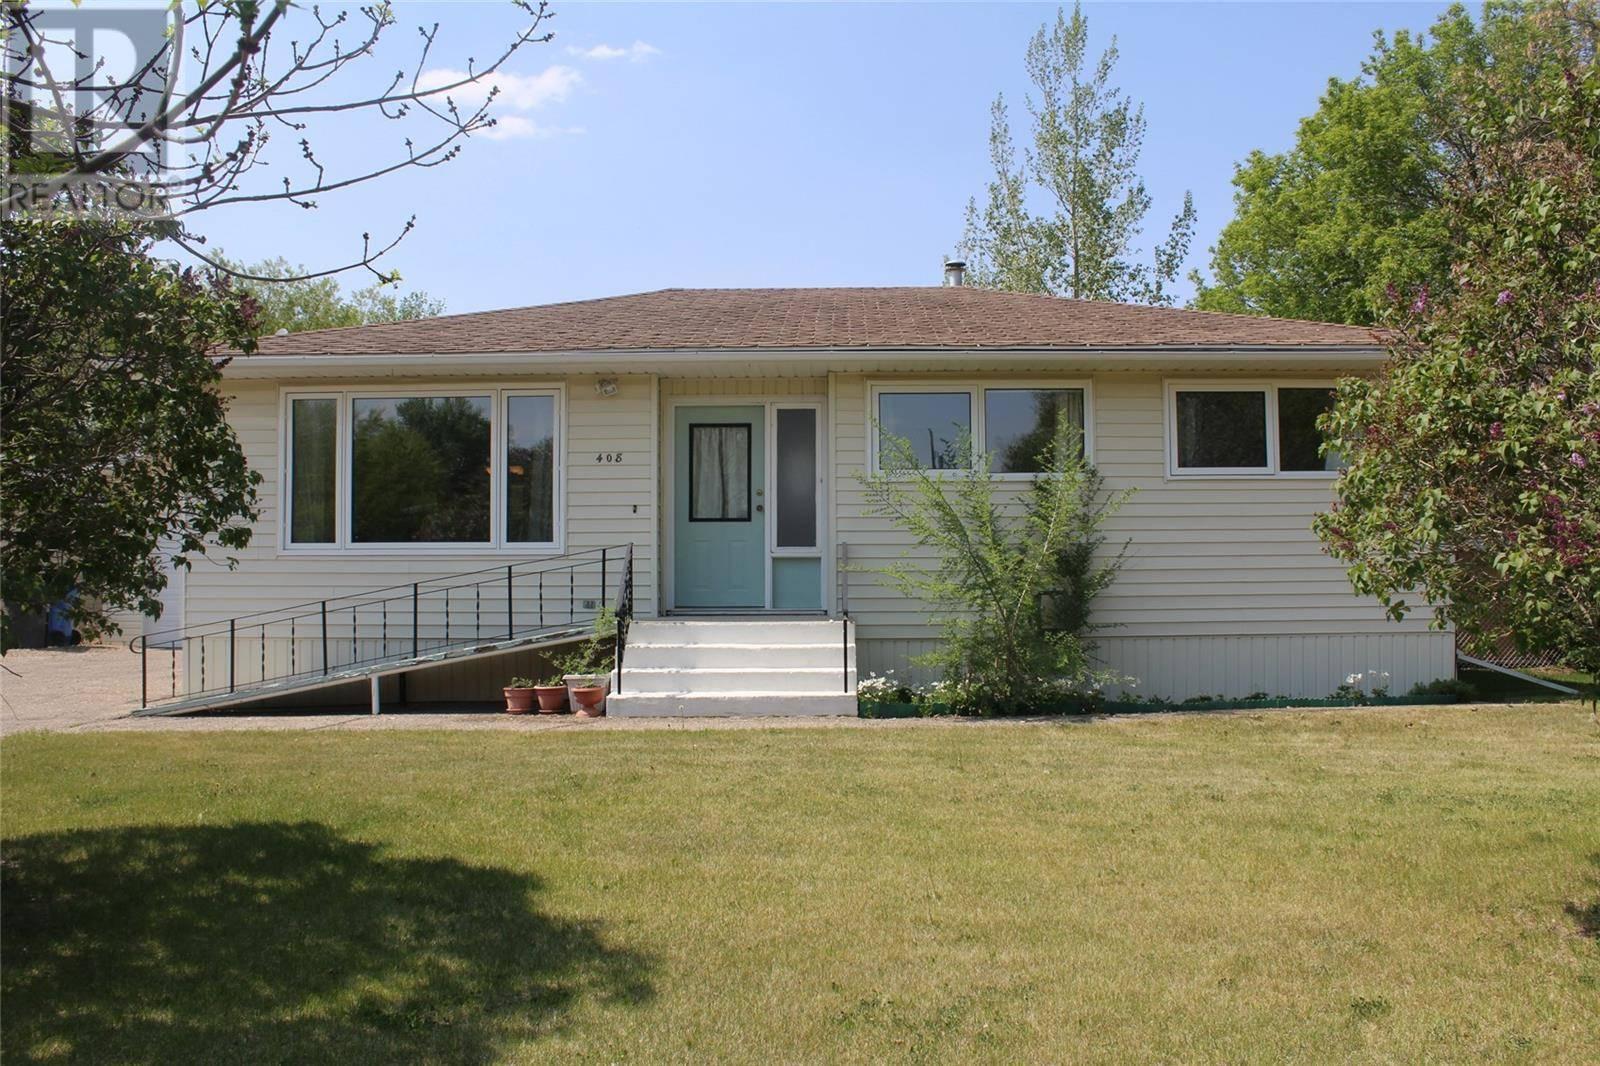 House for sale at 408 Walter St Stoughton Saskatchewan - MLS: SK773828